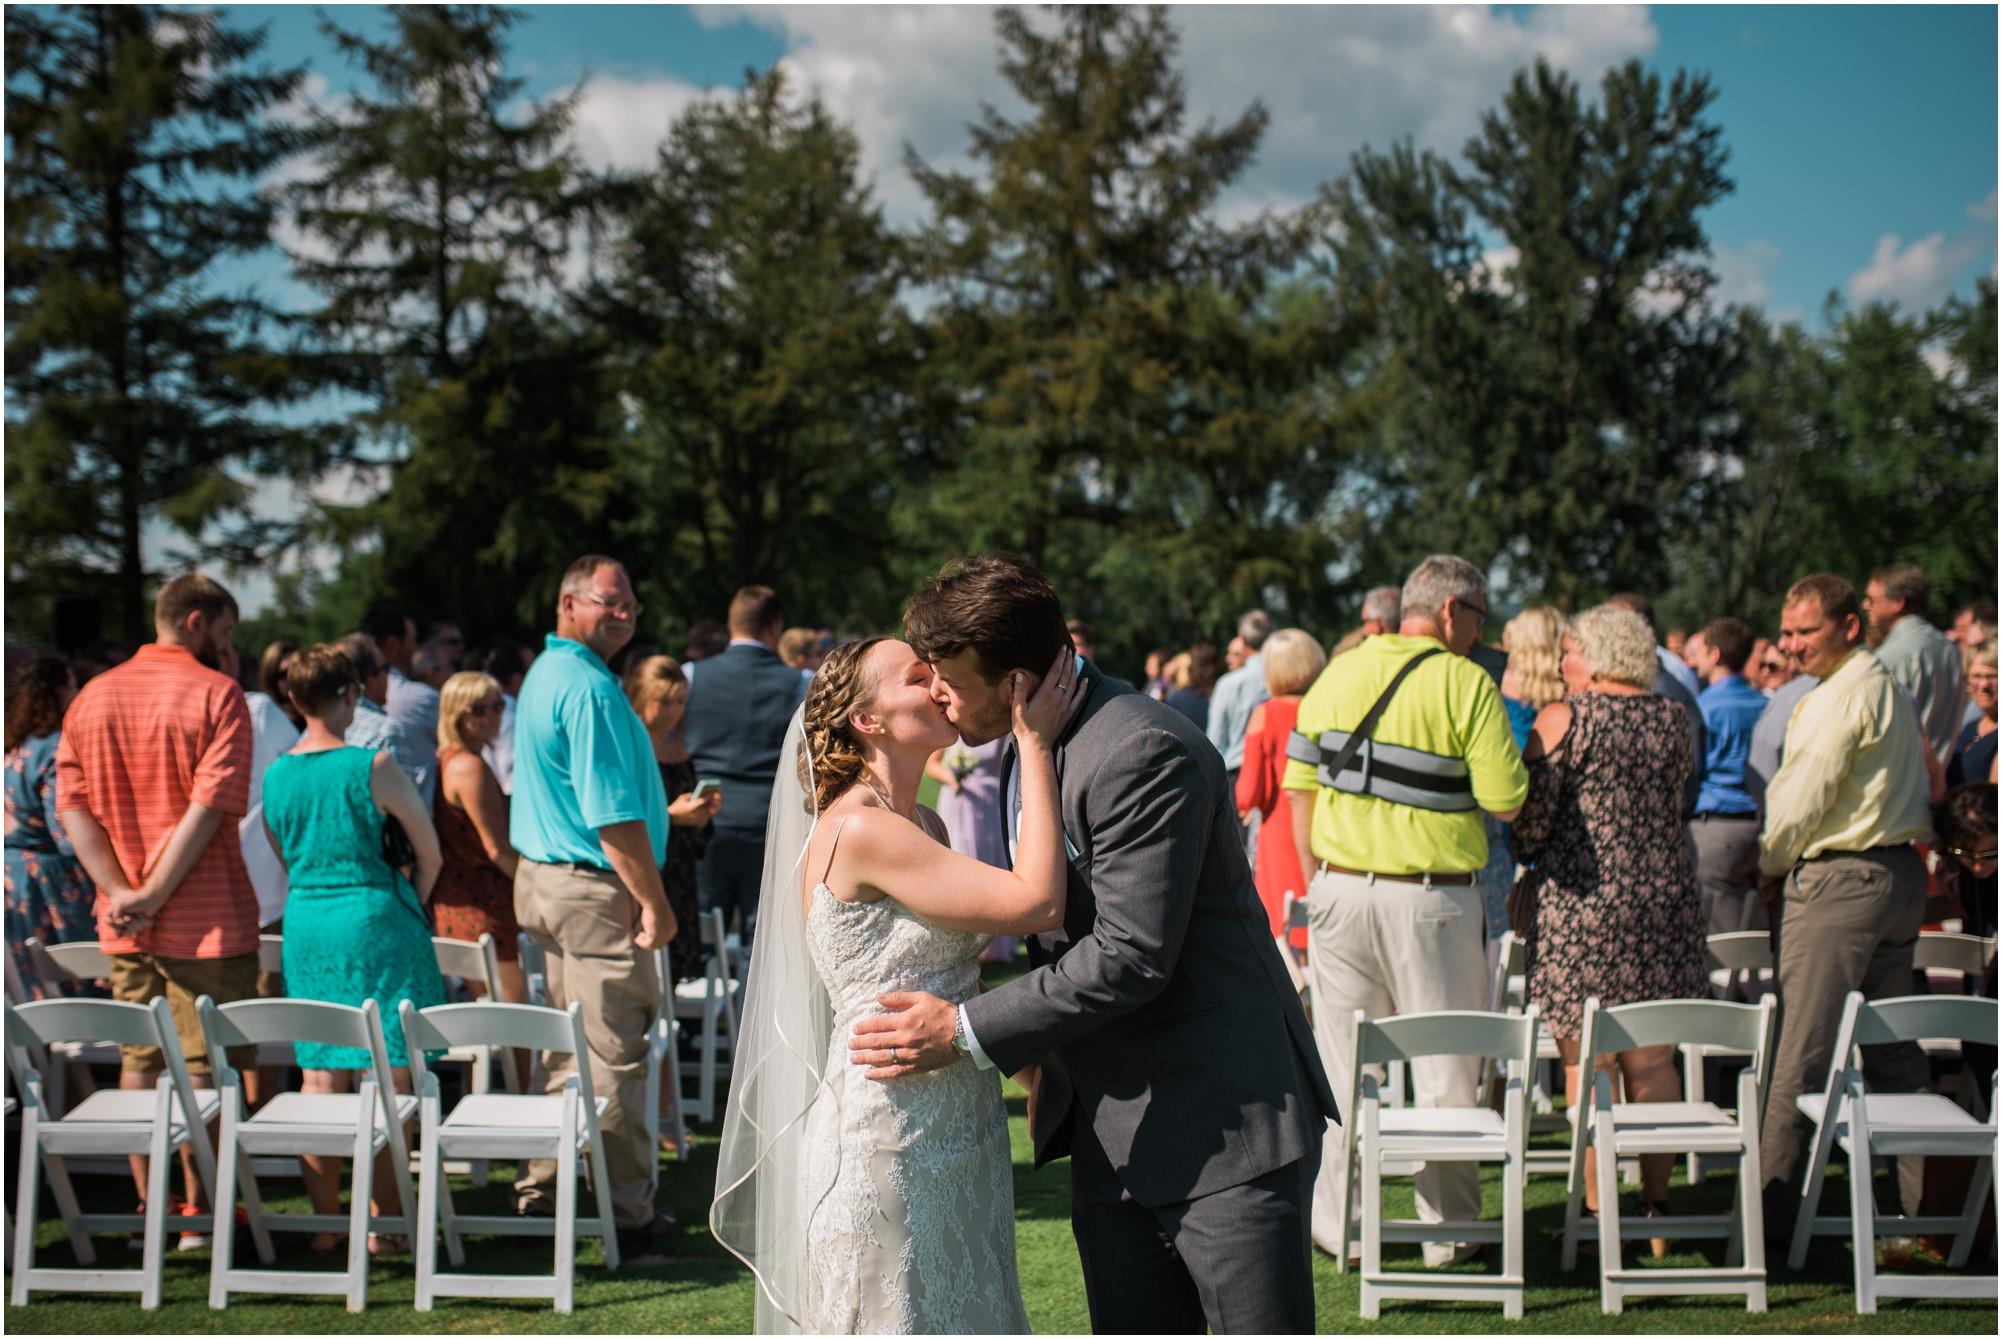 Wisconsin-Wedding-Photographer-Reedsburg-Country-Club-Kaela-and Matt-Wedding-528.jpg